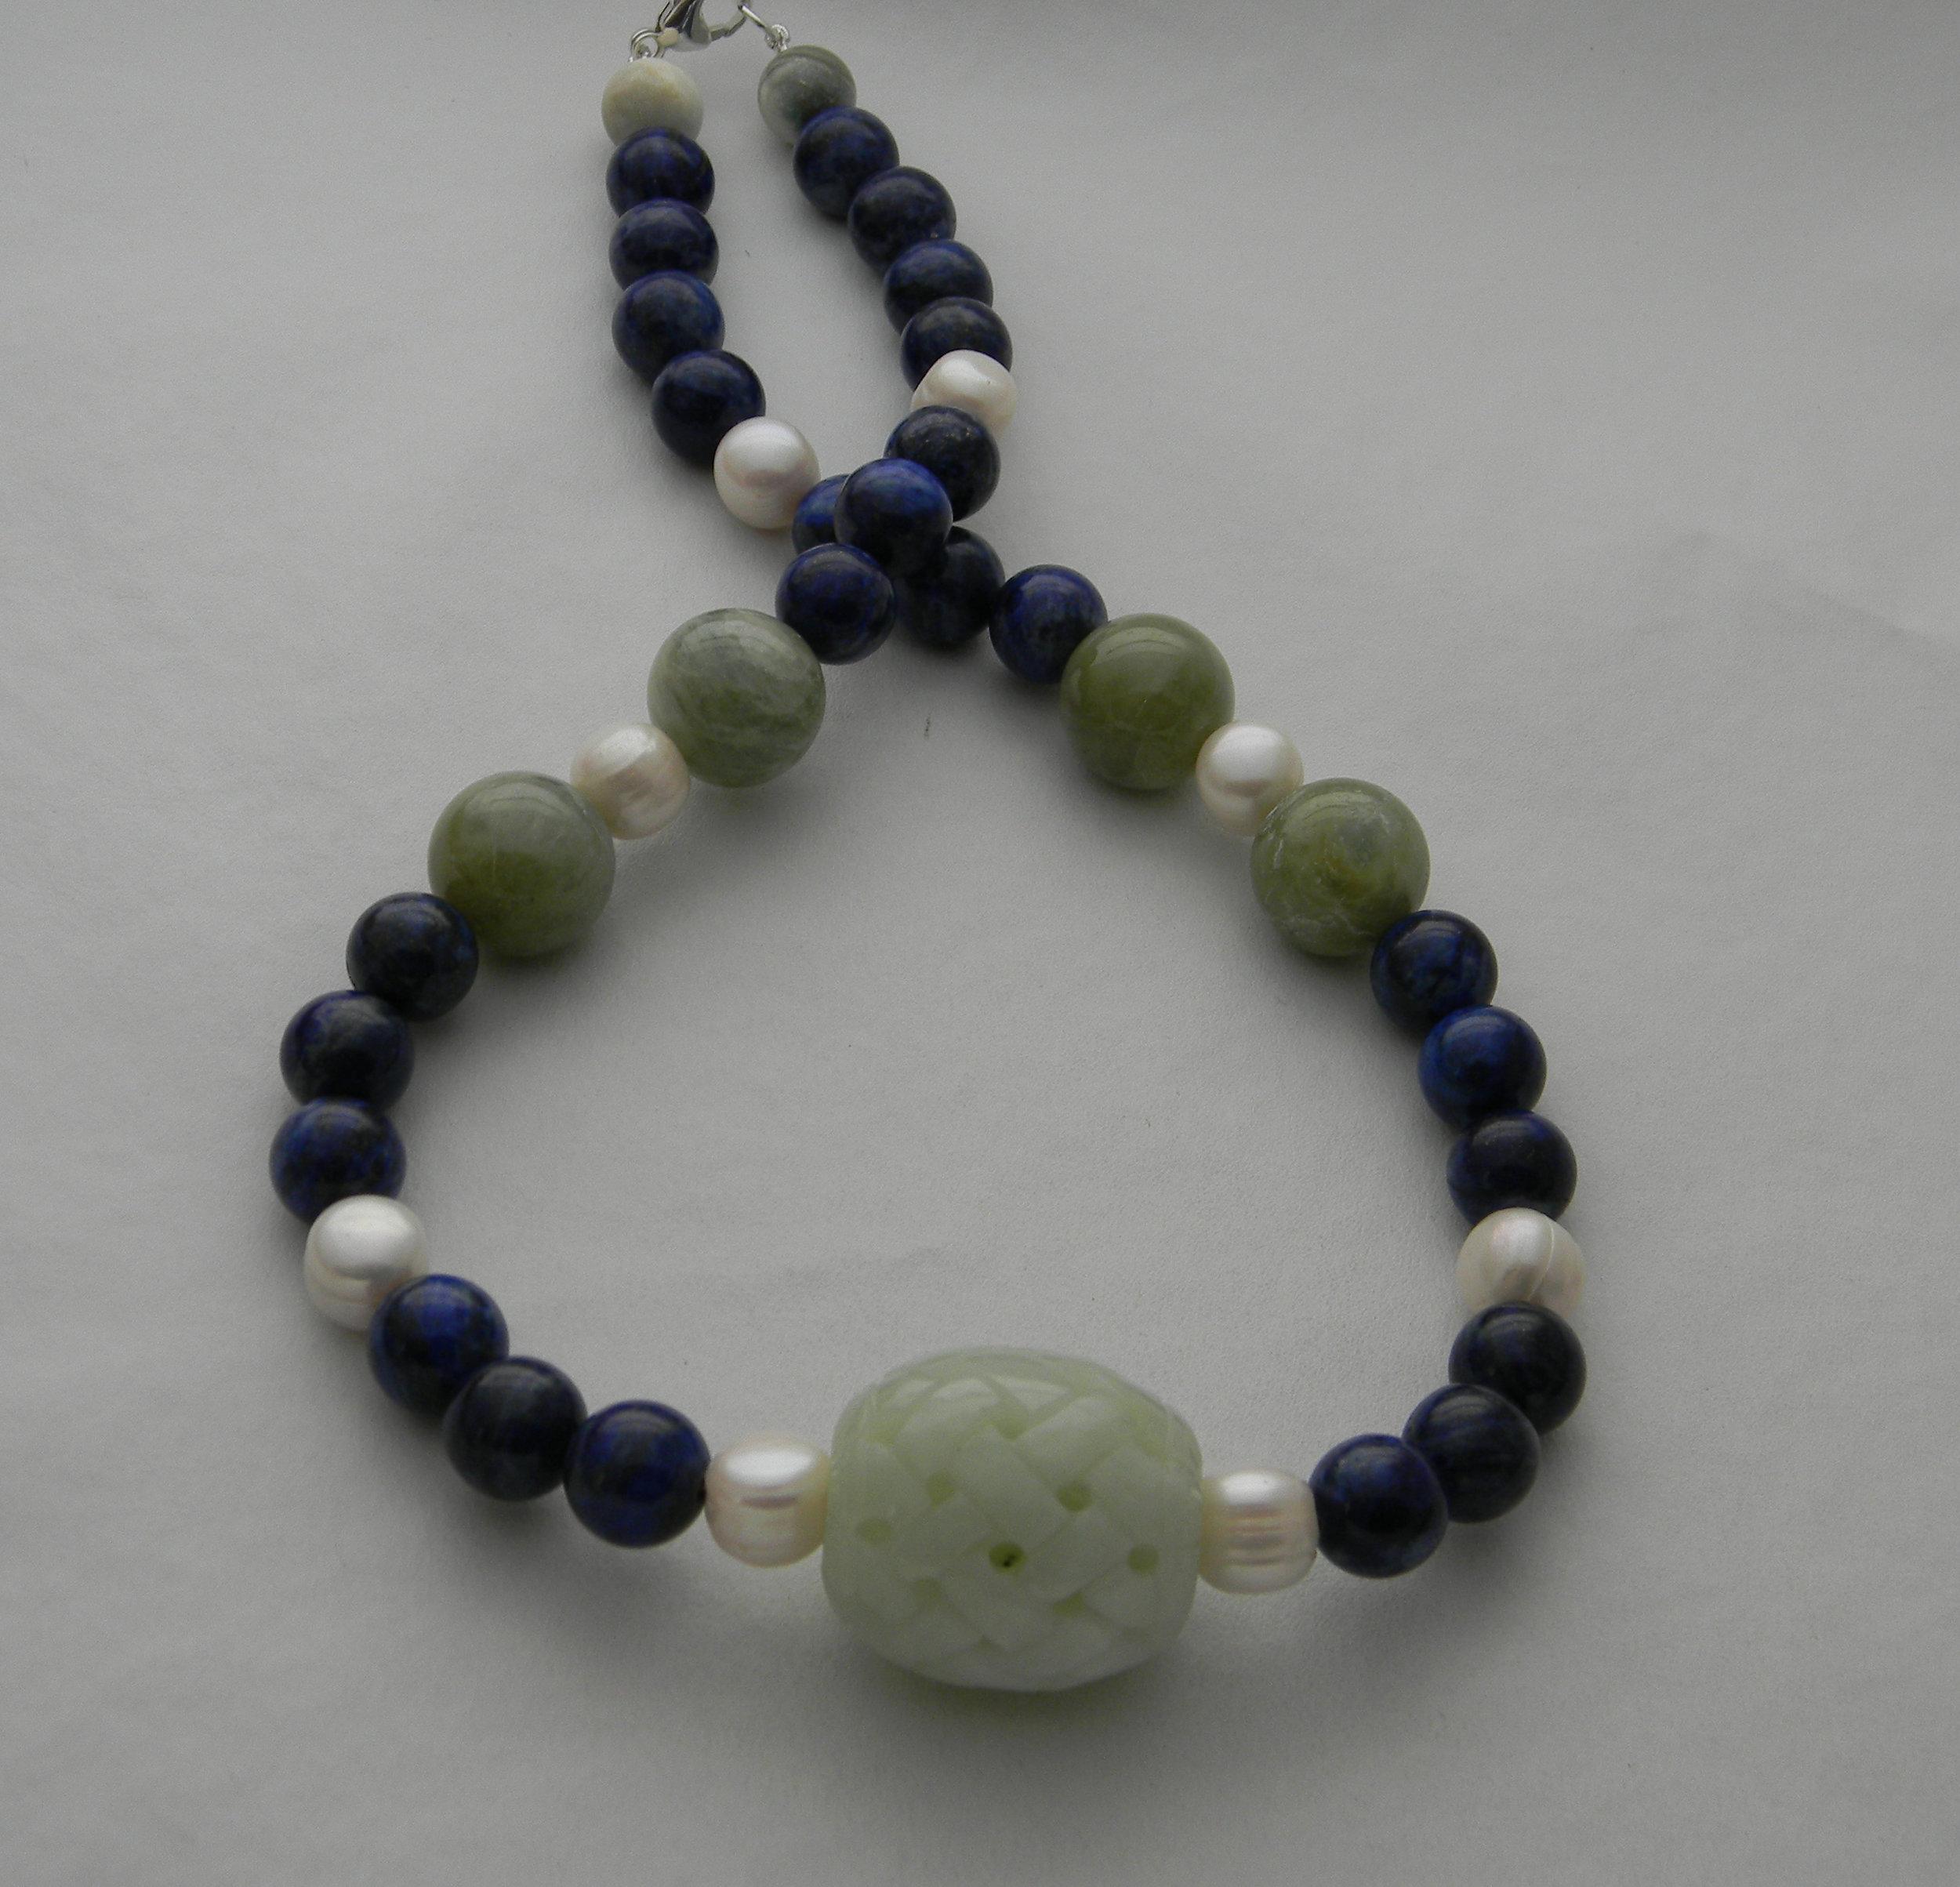 Celadon Jade pendant on lapis & pearls beads necklace ,